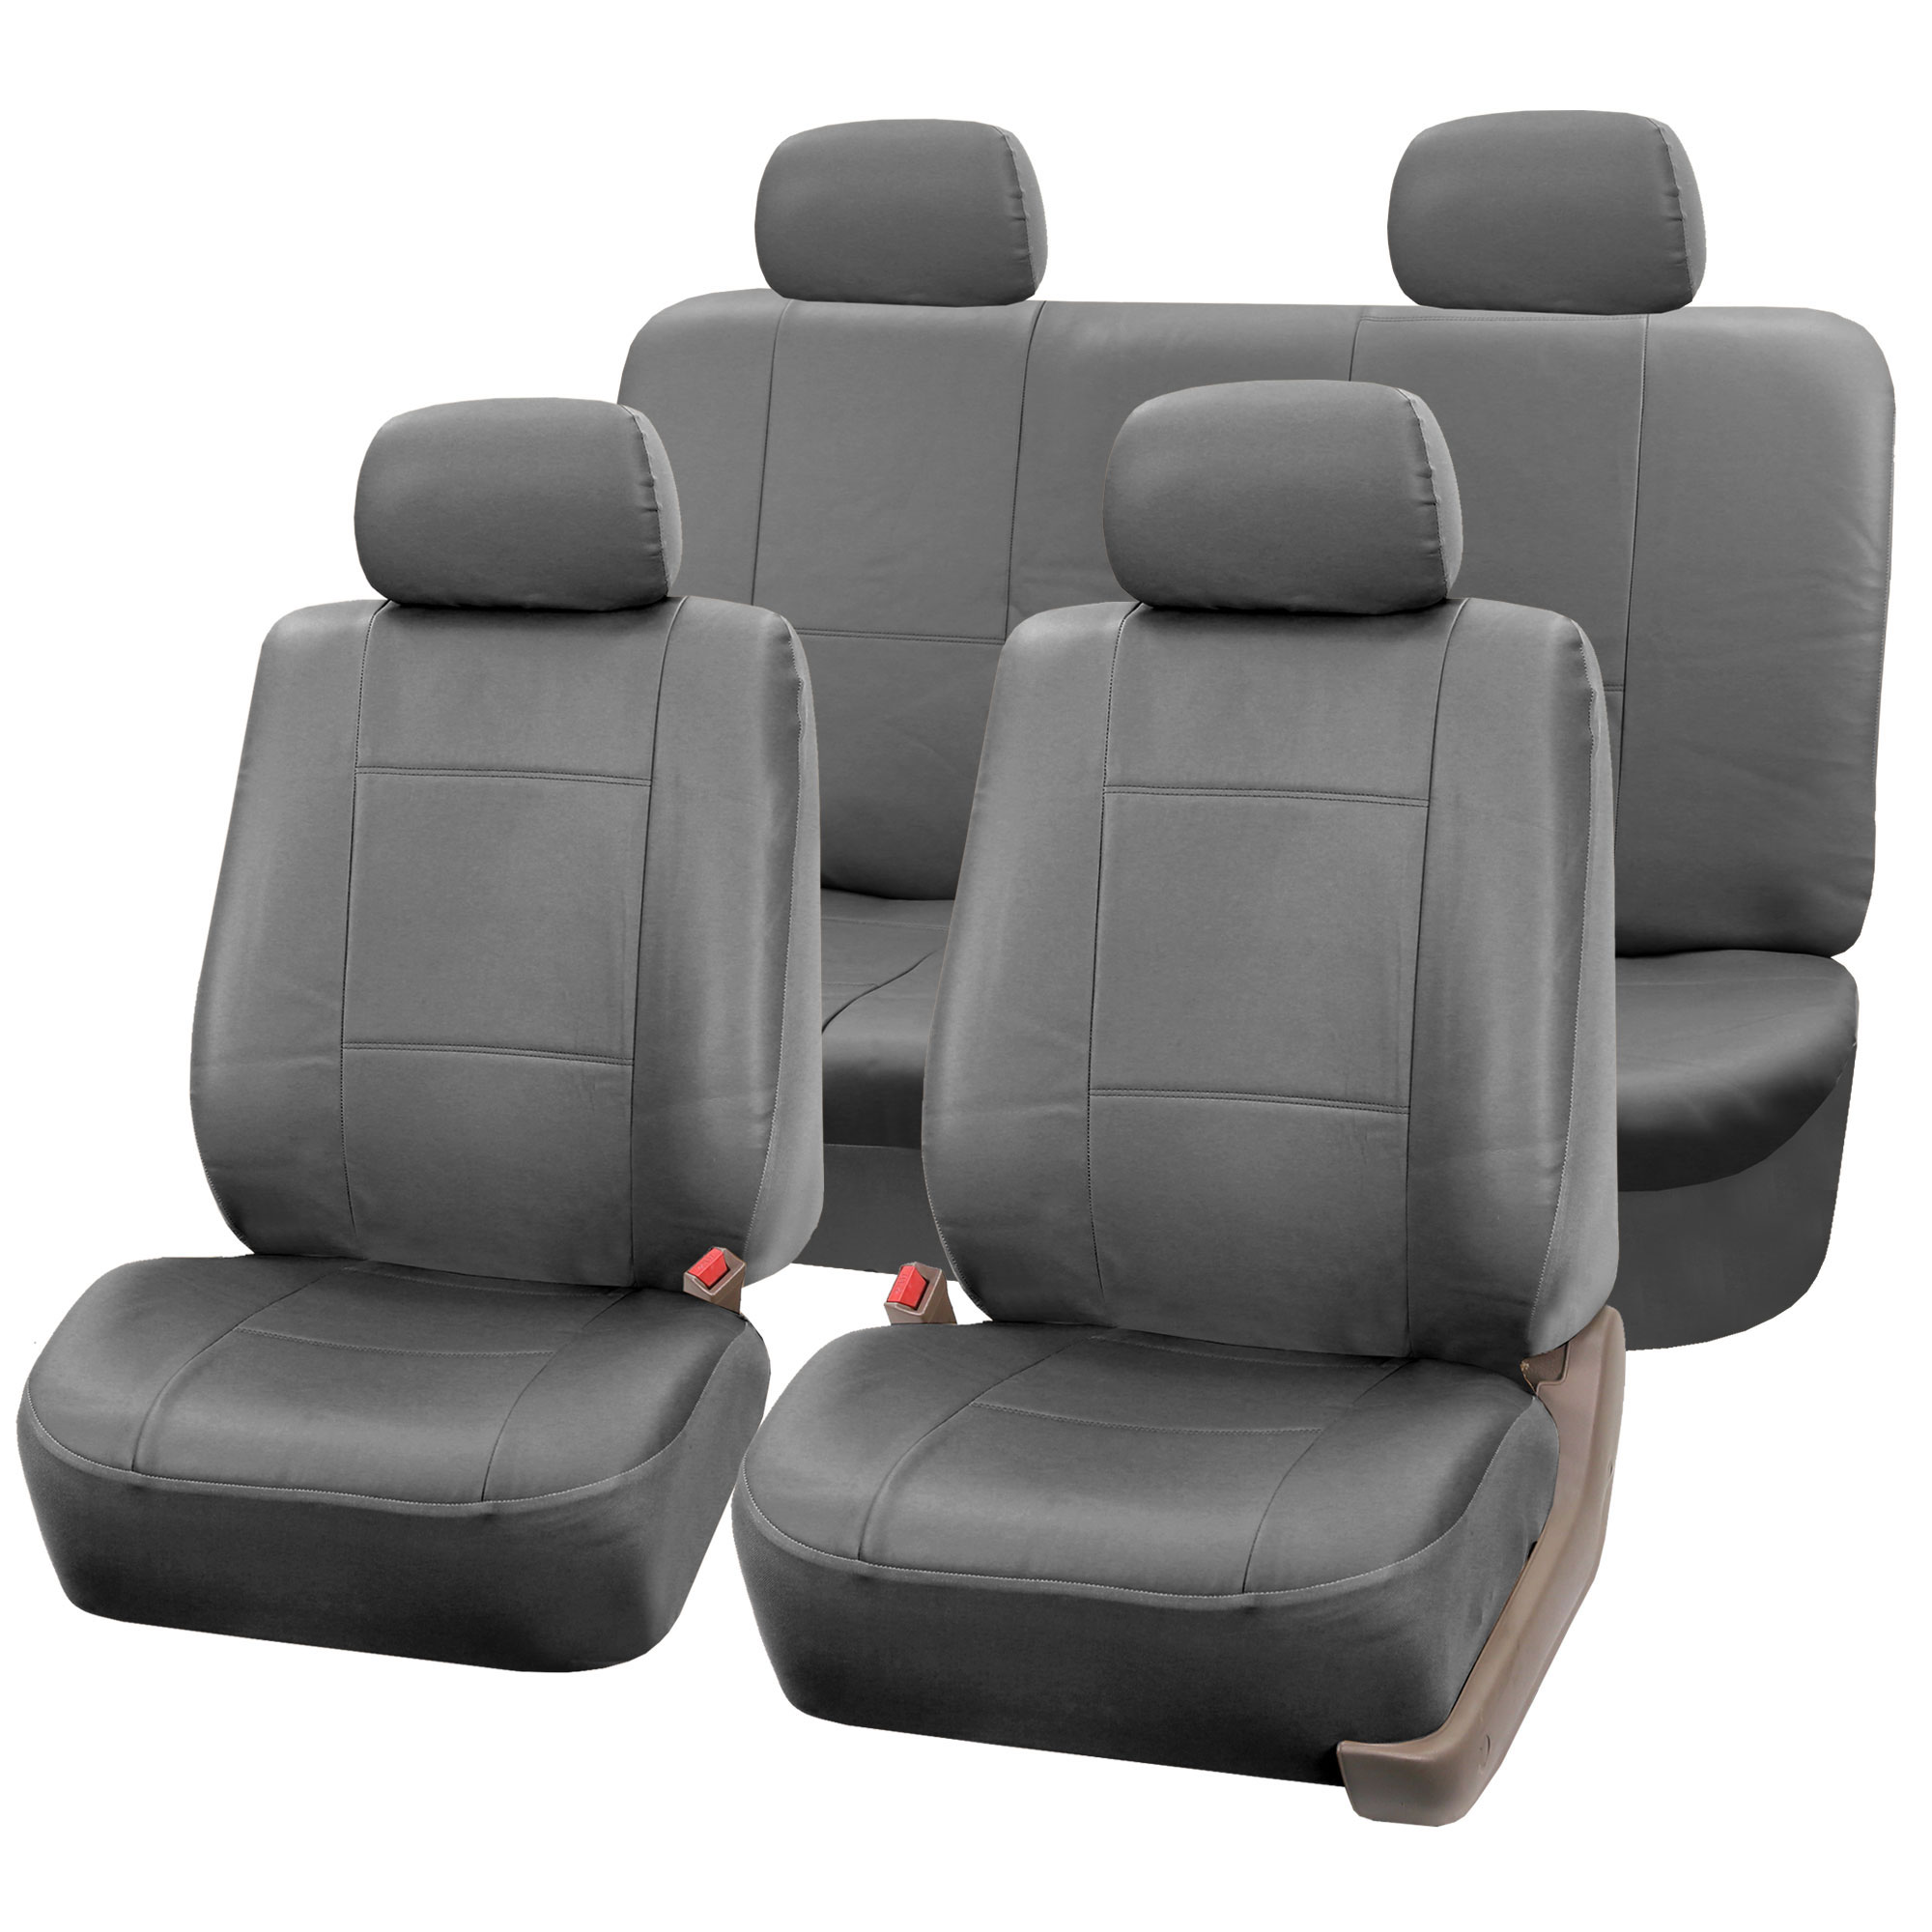 Ebay Car Seat Cover Sets